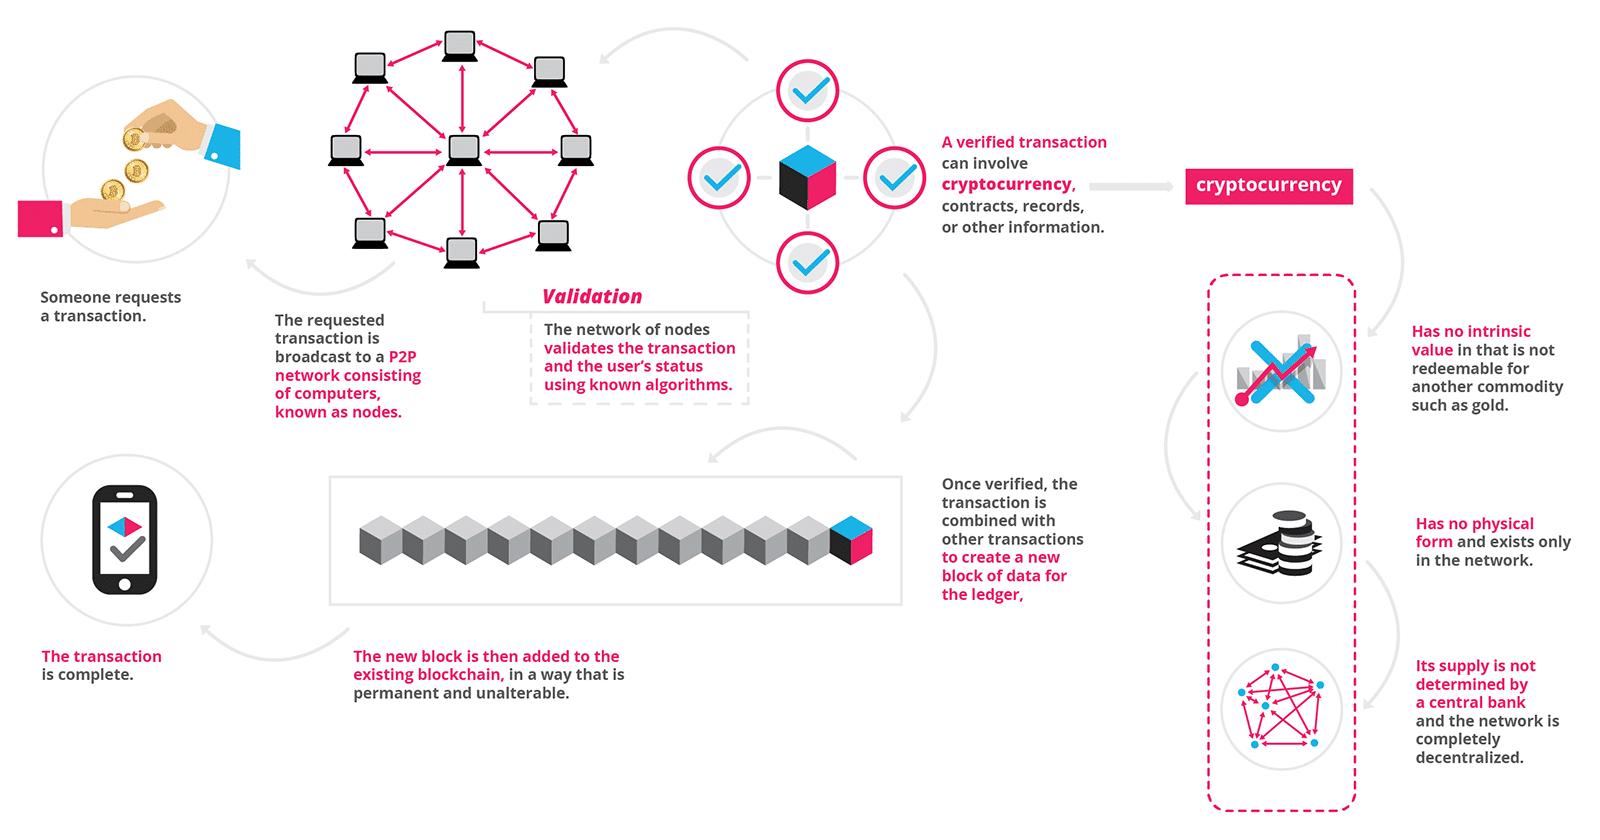 How blockchain technology works. Image via https://blockgeeks.com/guides/what-is-blockchain-technology/